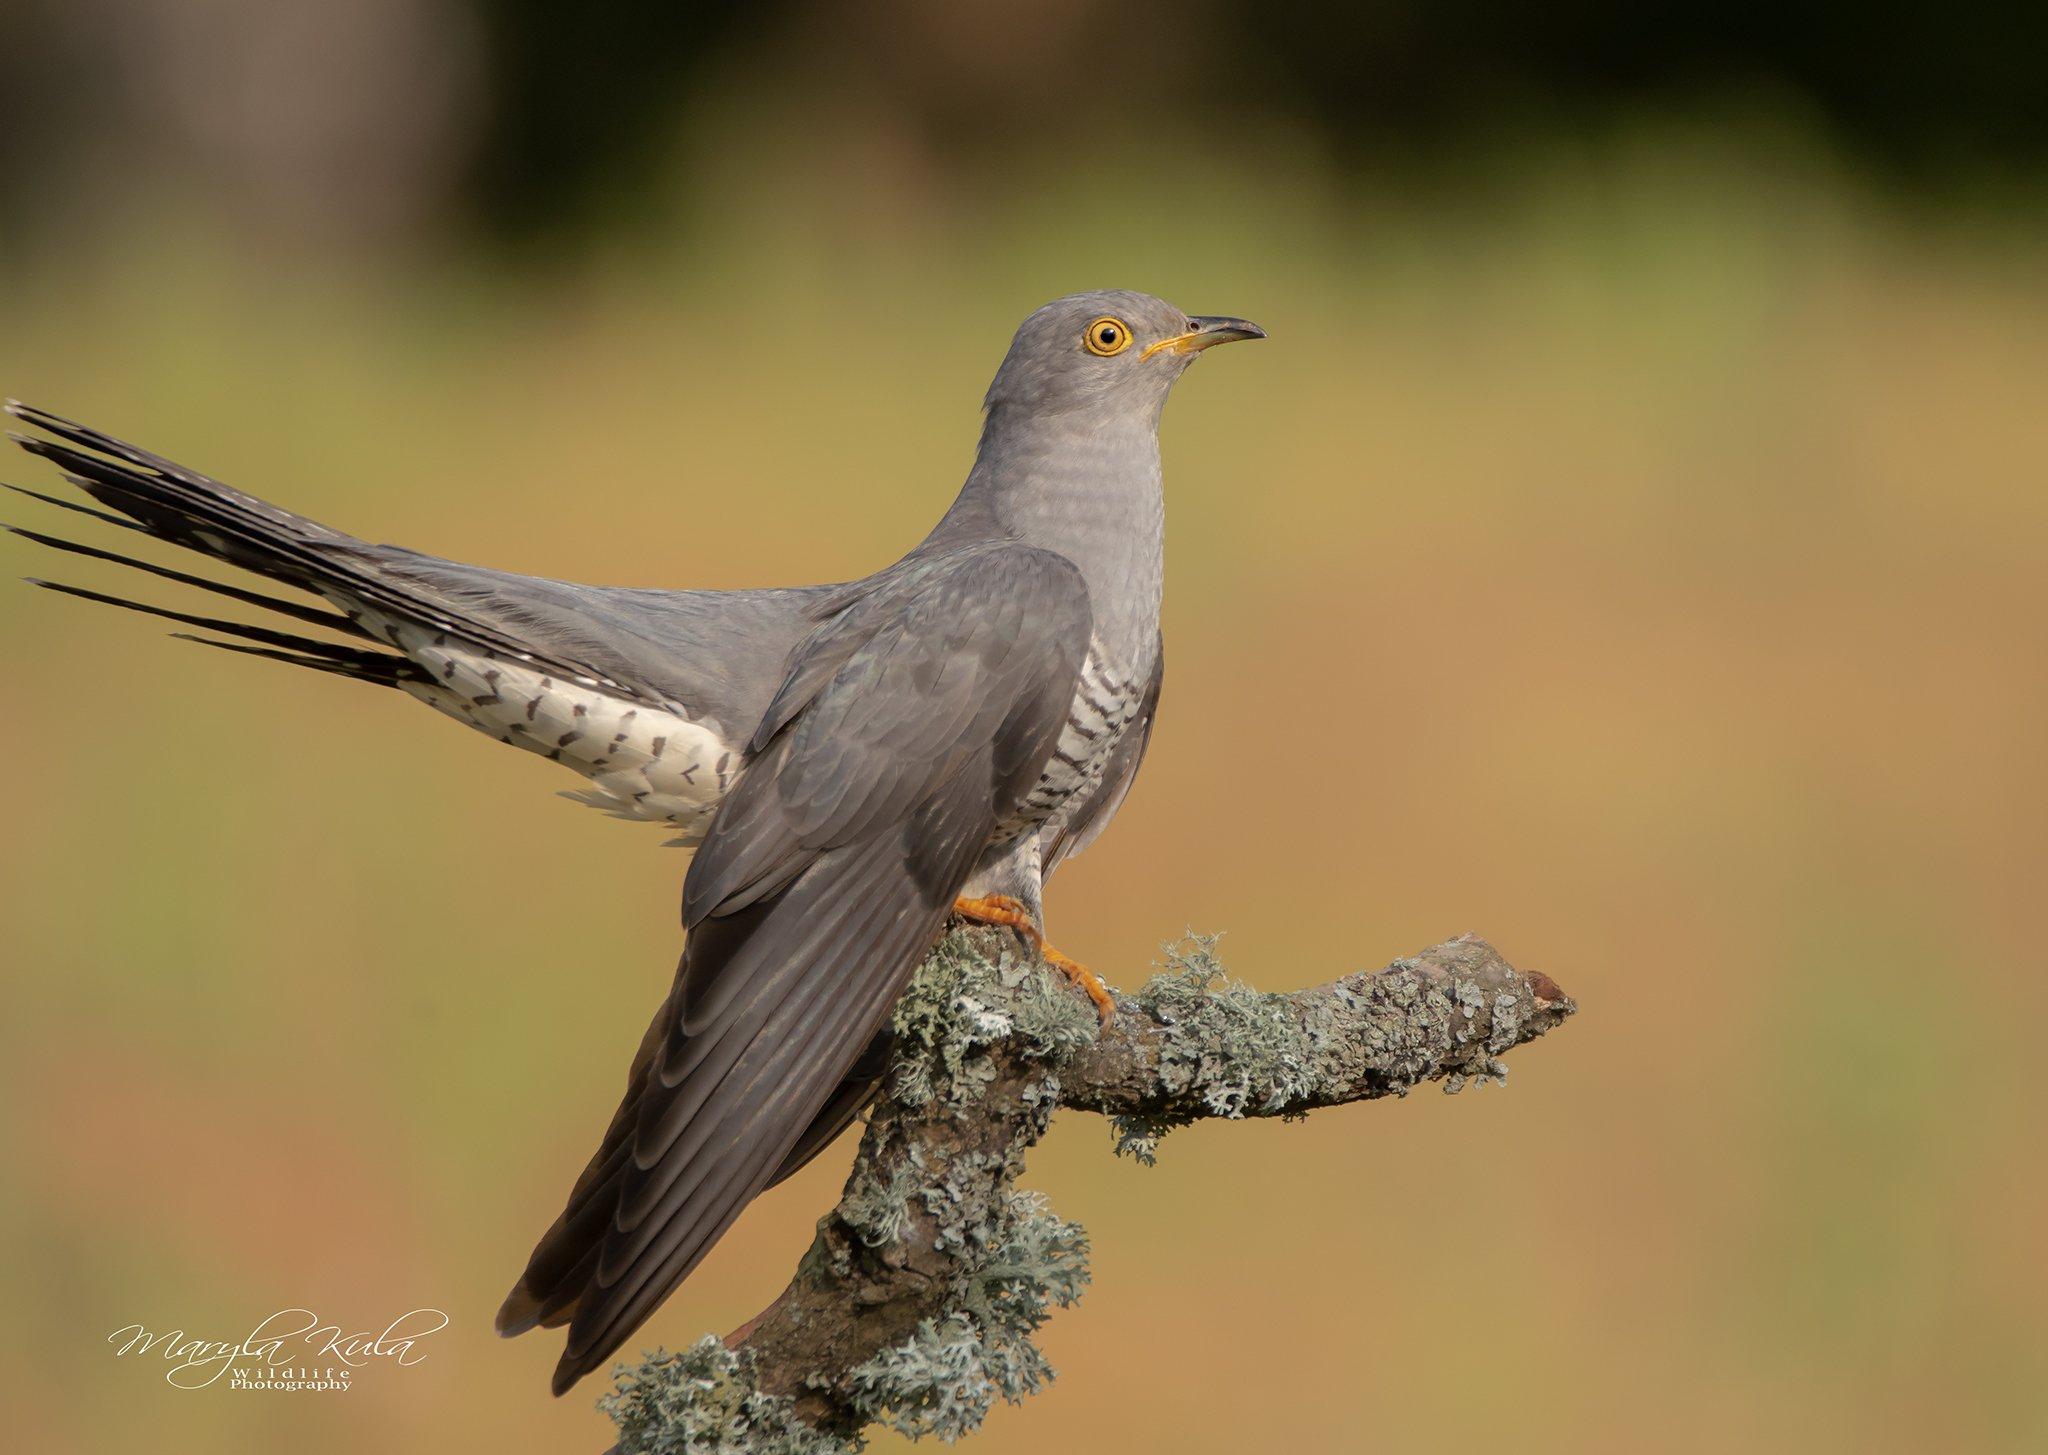 cuckoo, birds, nature, wildlife, woods, MARIA KULA